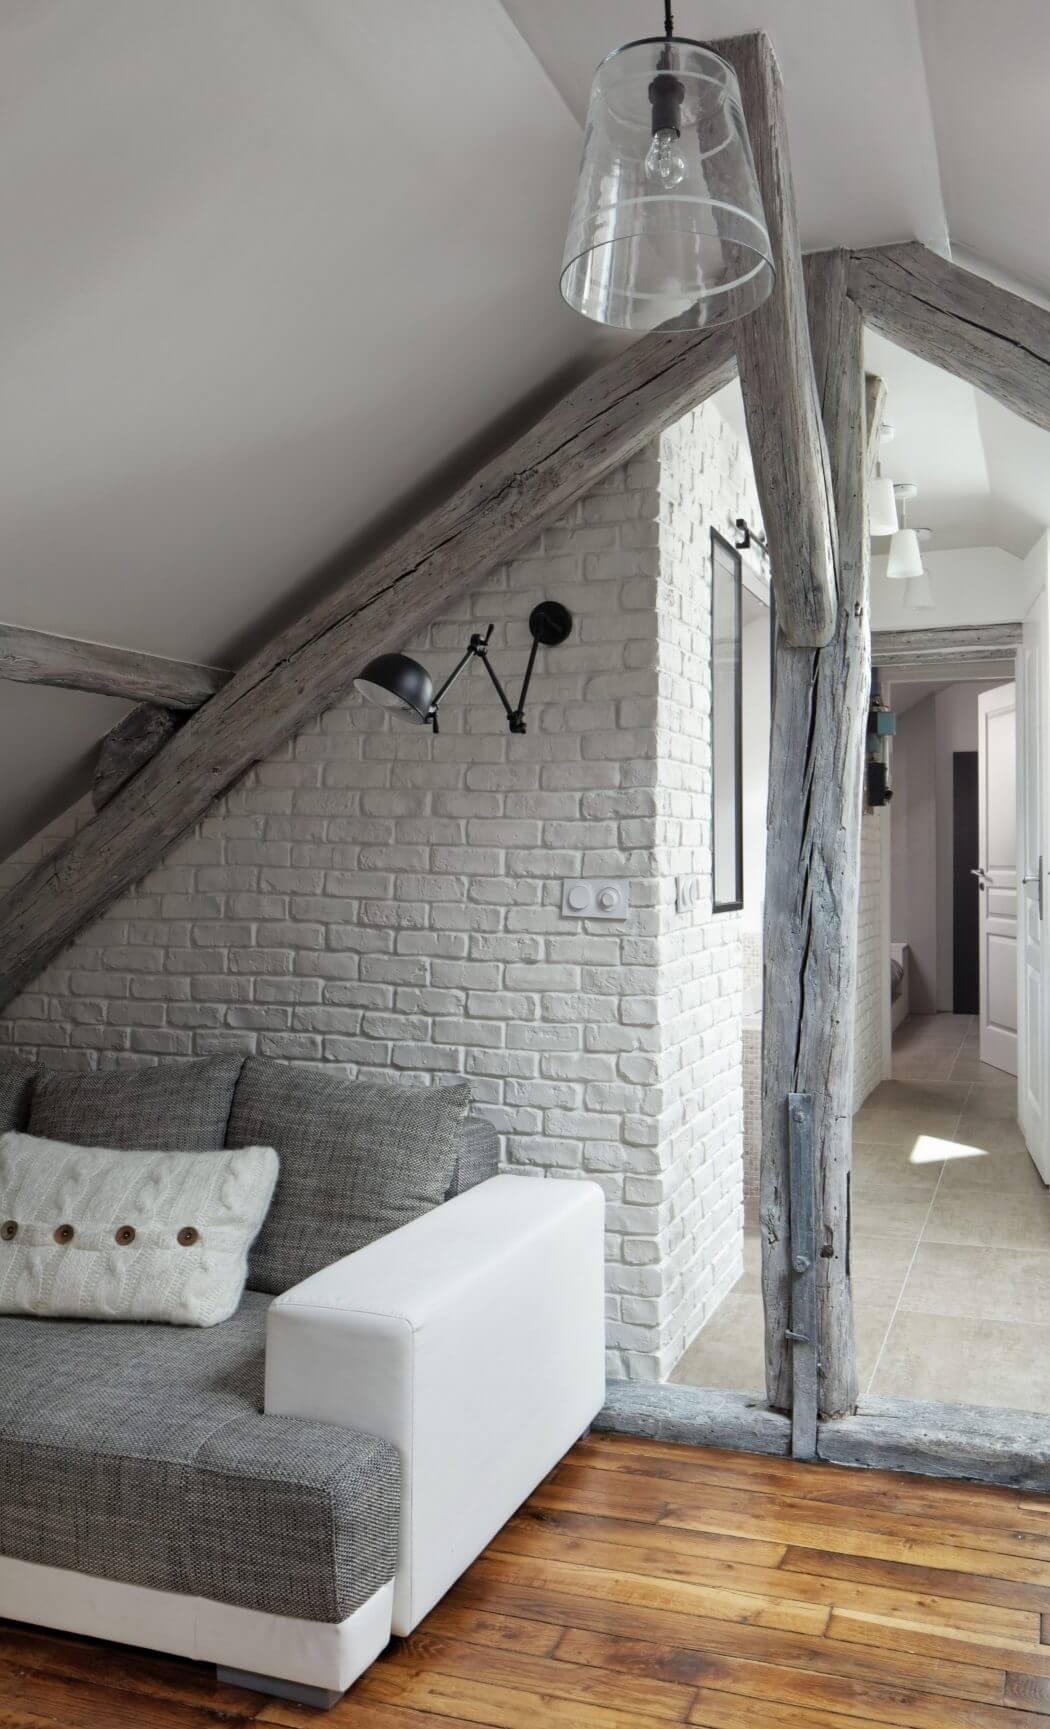 Charming small Parisian apartment